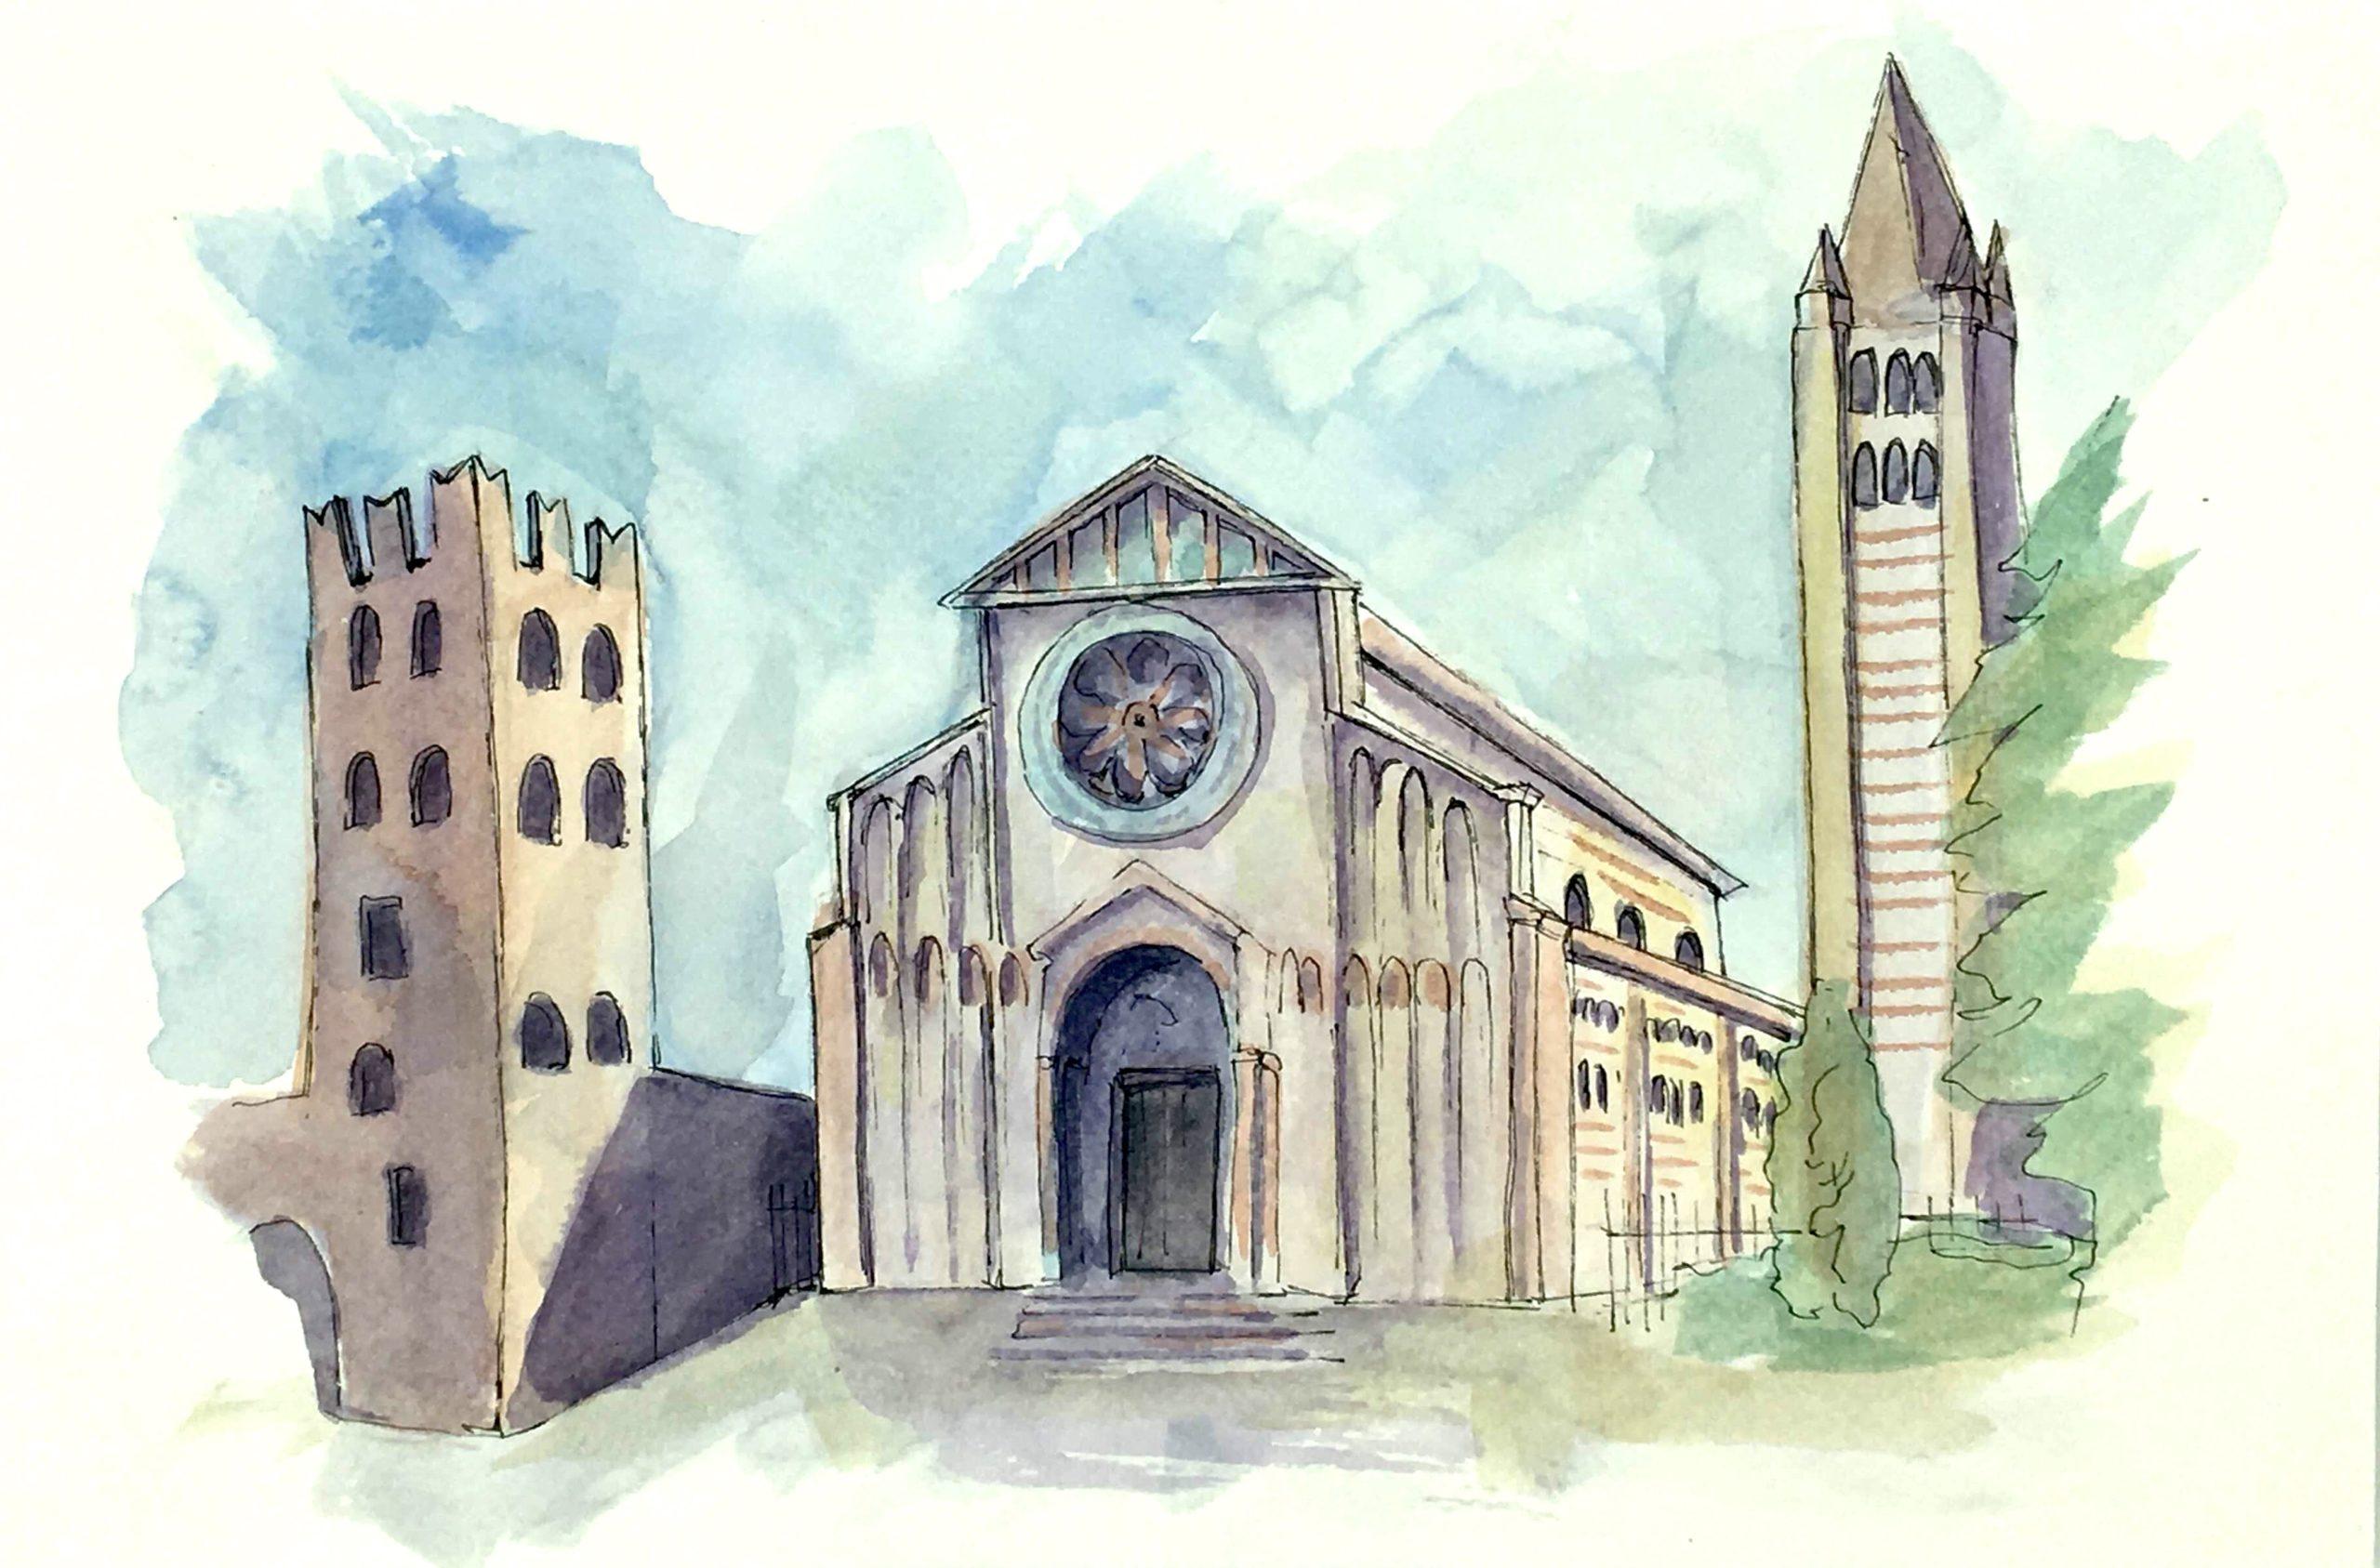 Painting of the Basilica of San Zeno in Verona